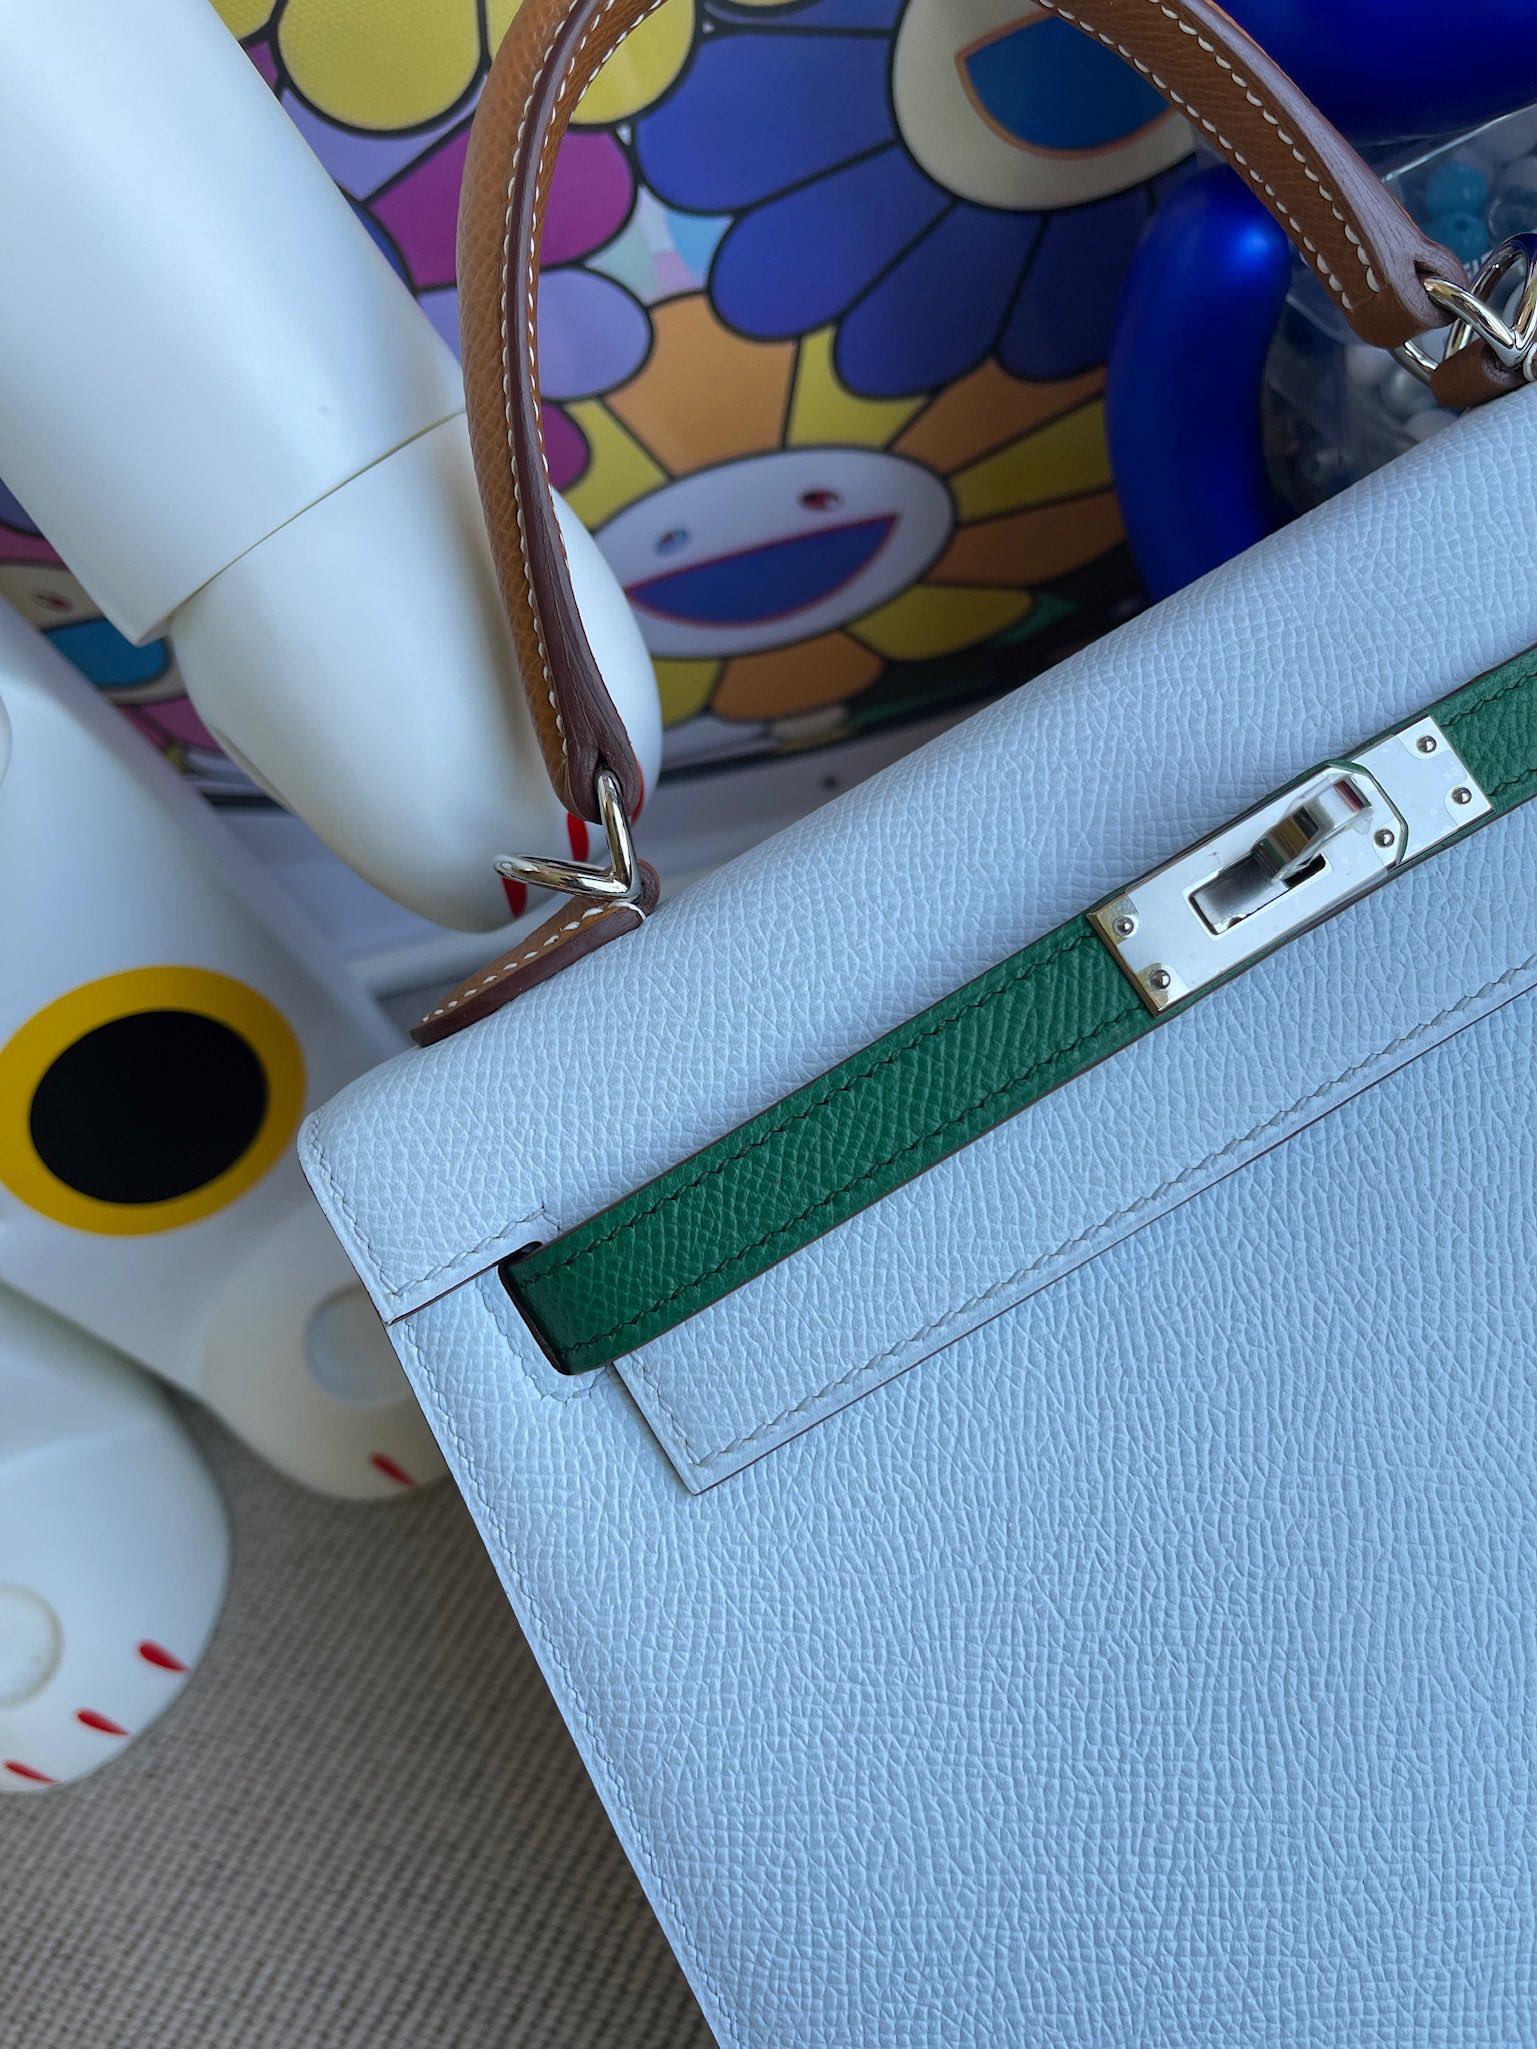 Hermès(爱马仕)Kelly 凯莉包 Epsom 原厂掌纹皮 雾蓝色 拼 丝绒绿 拼 金棕 银扣 25cm 马蹄印 顶级手缝